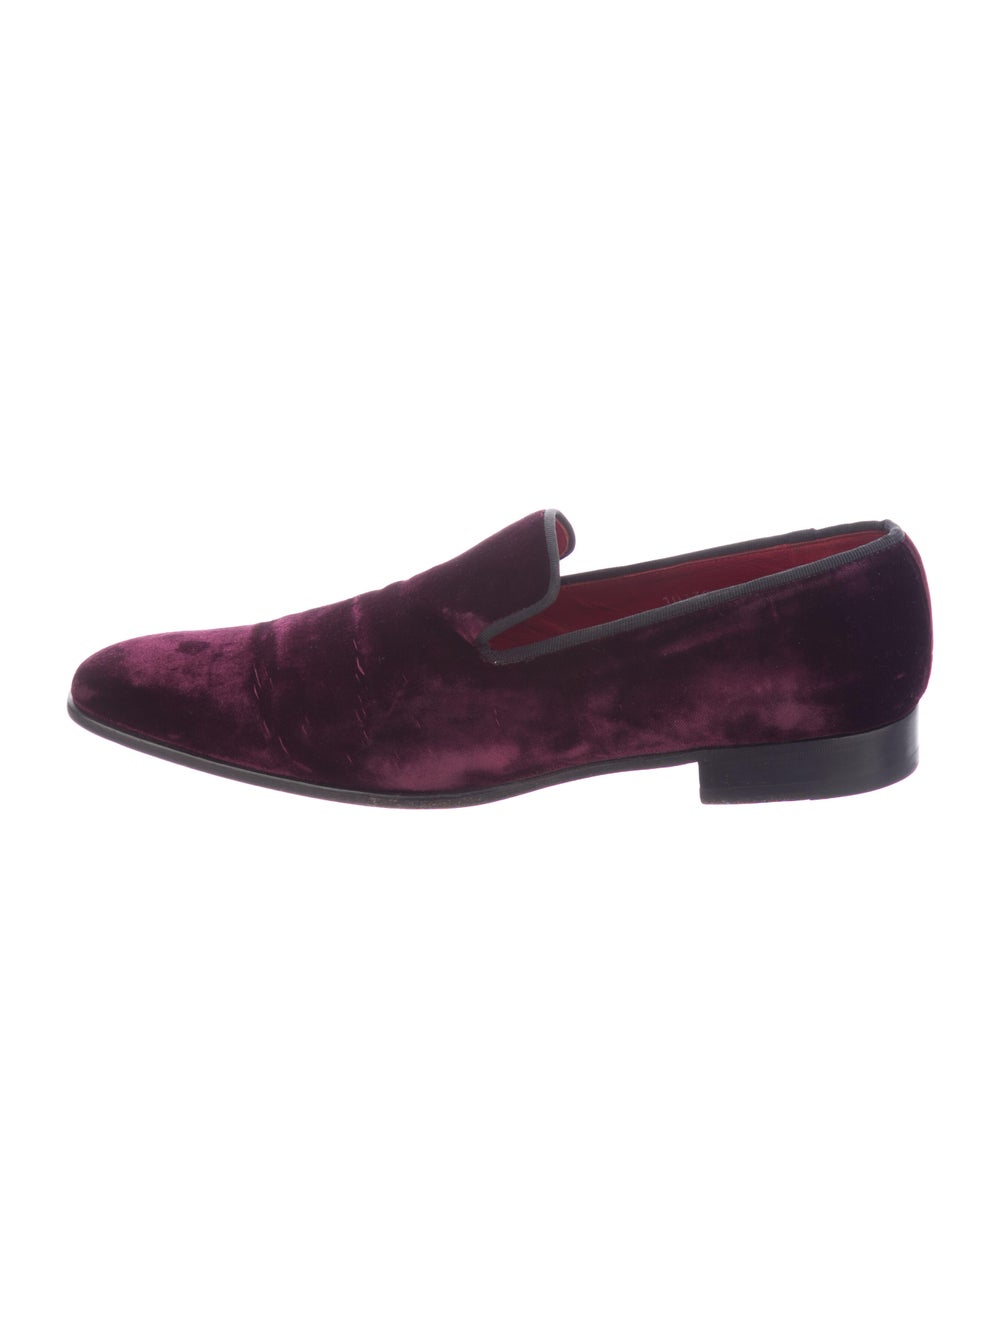 Magnanni Slippers Purple - image 1